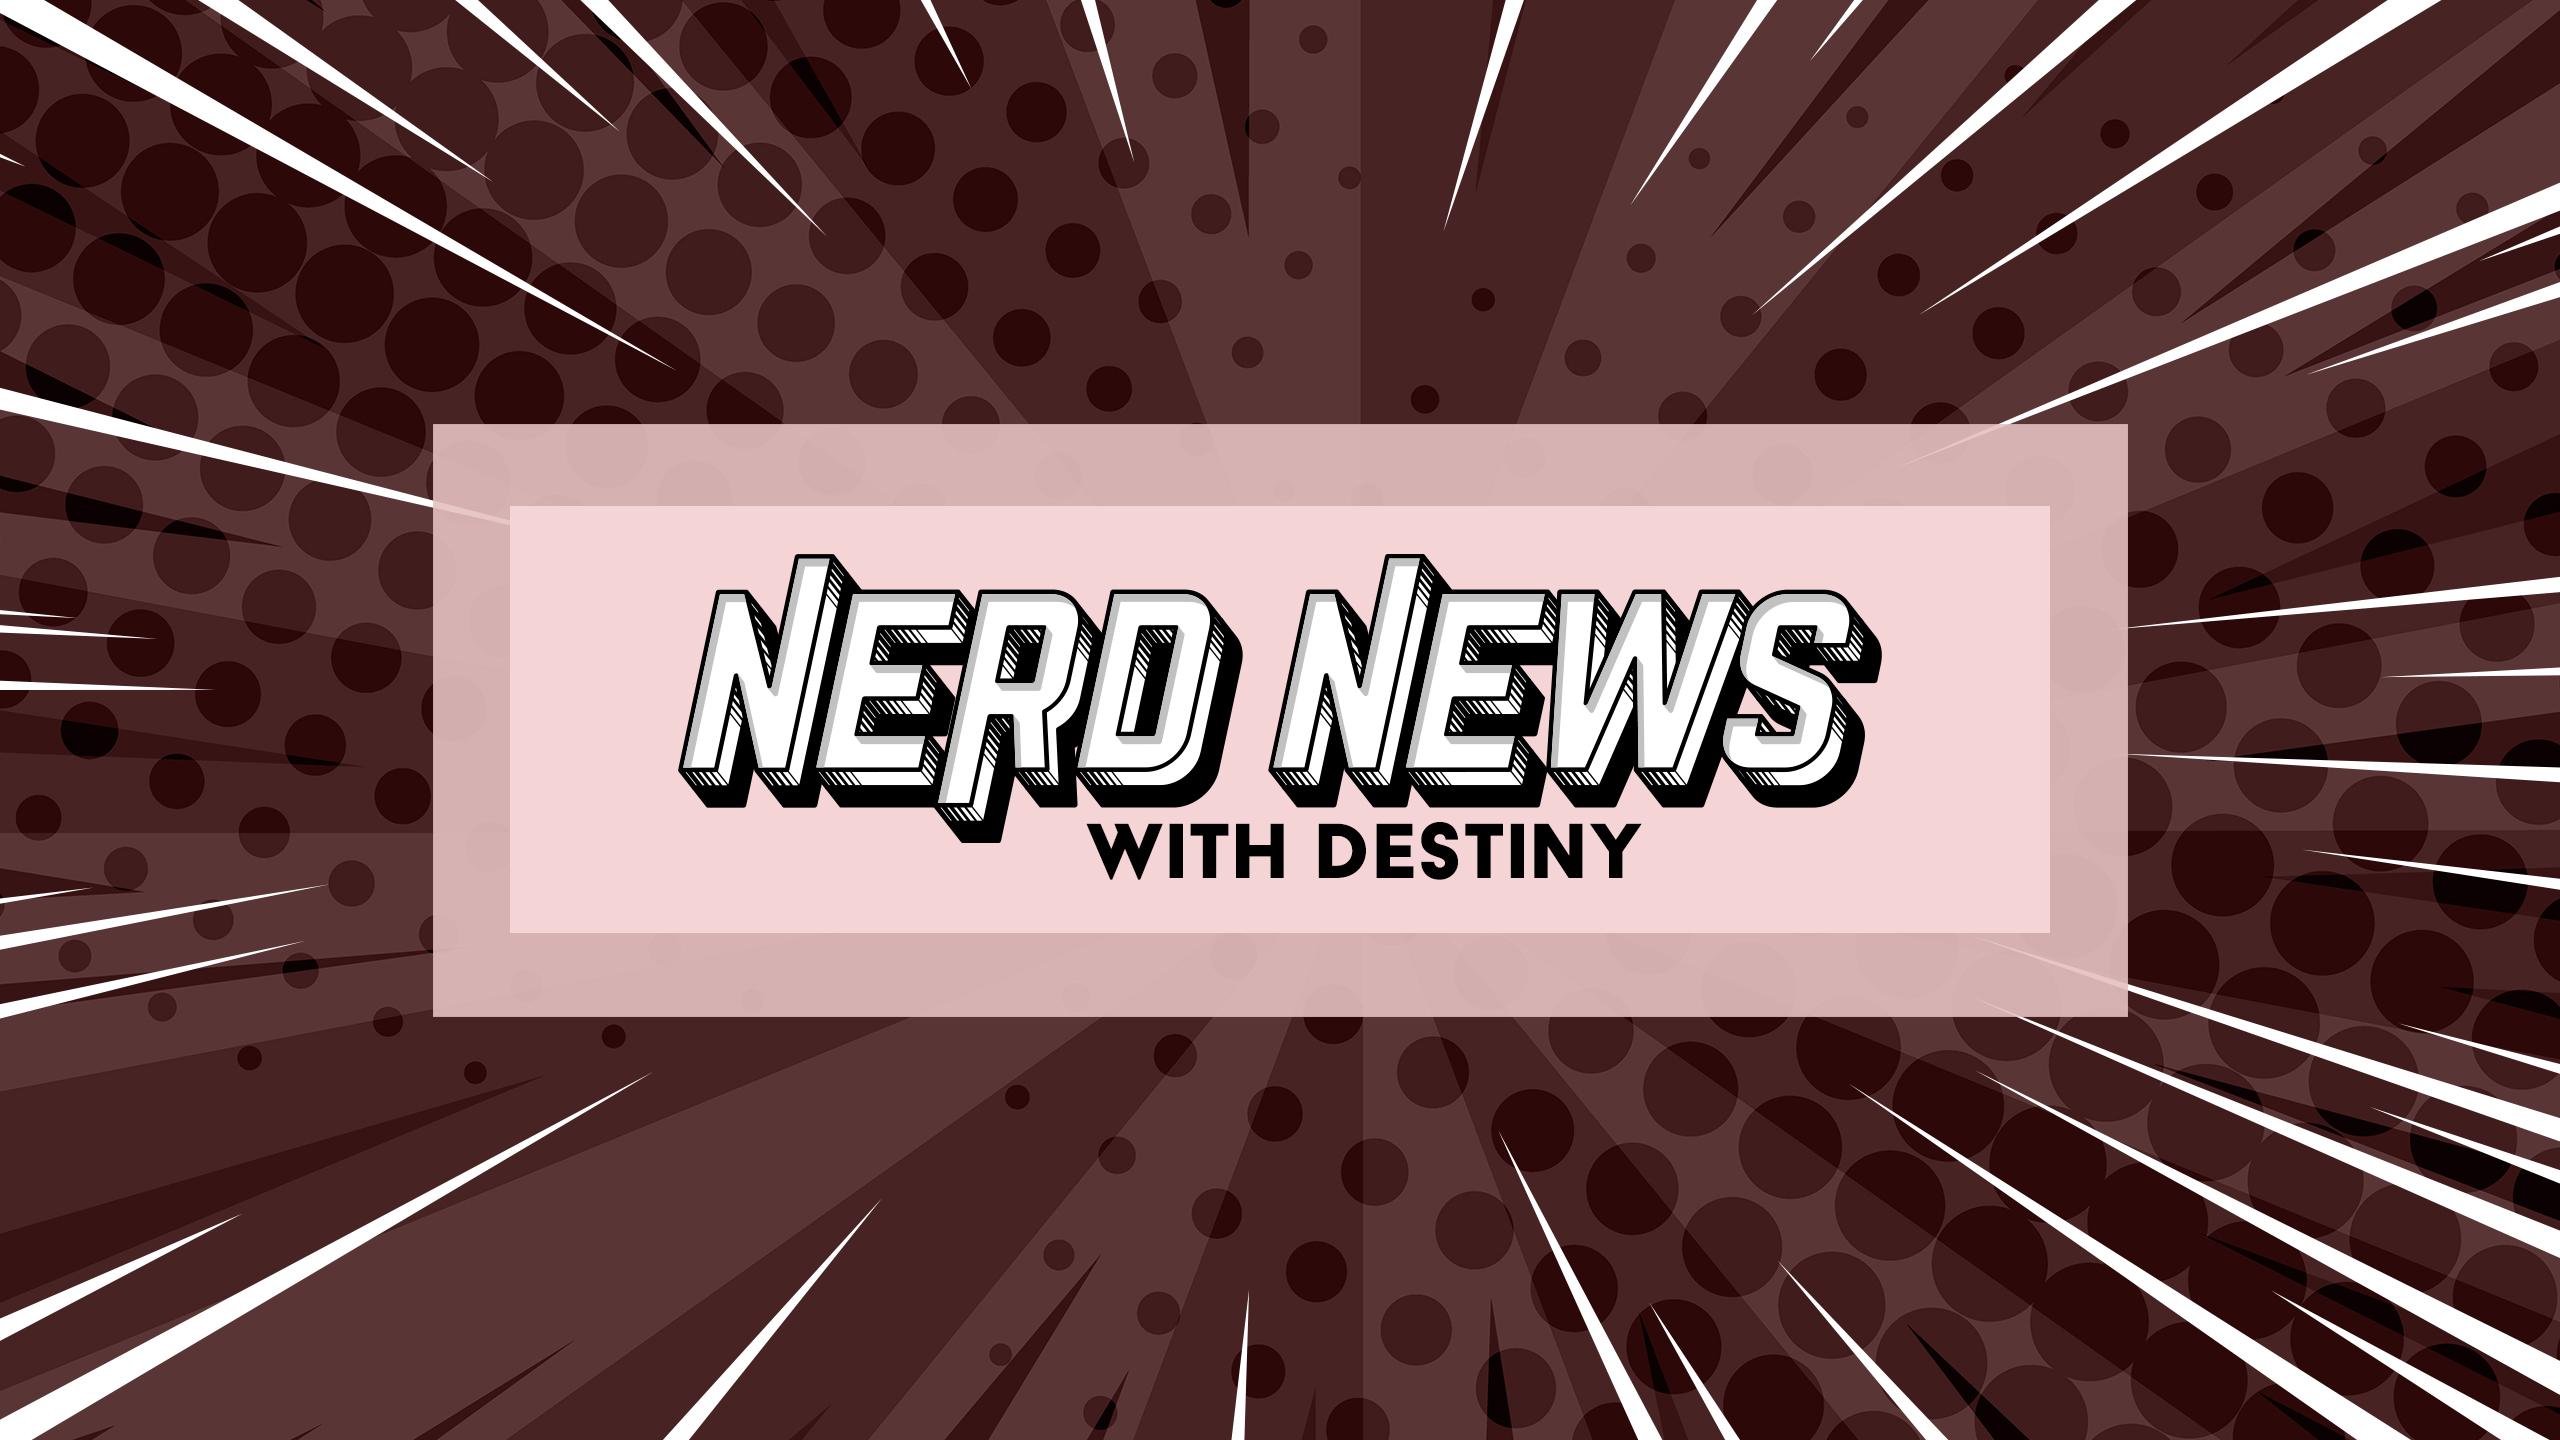 Nerd News with Destiny